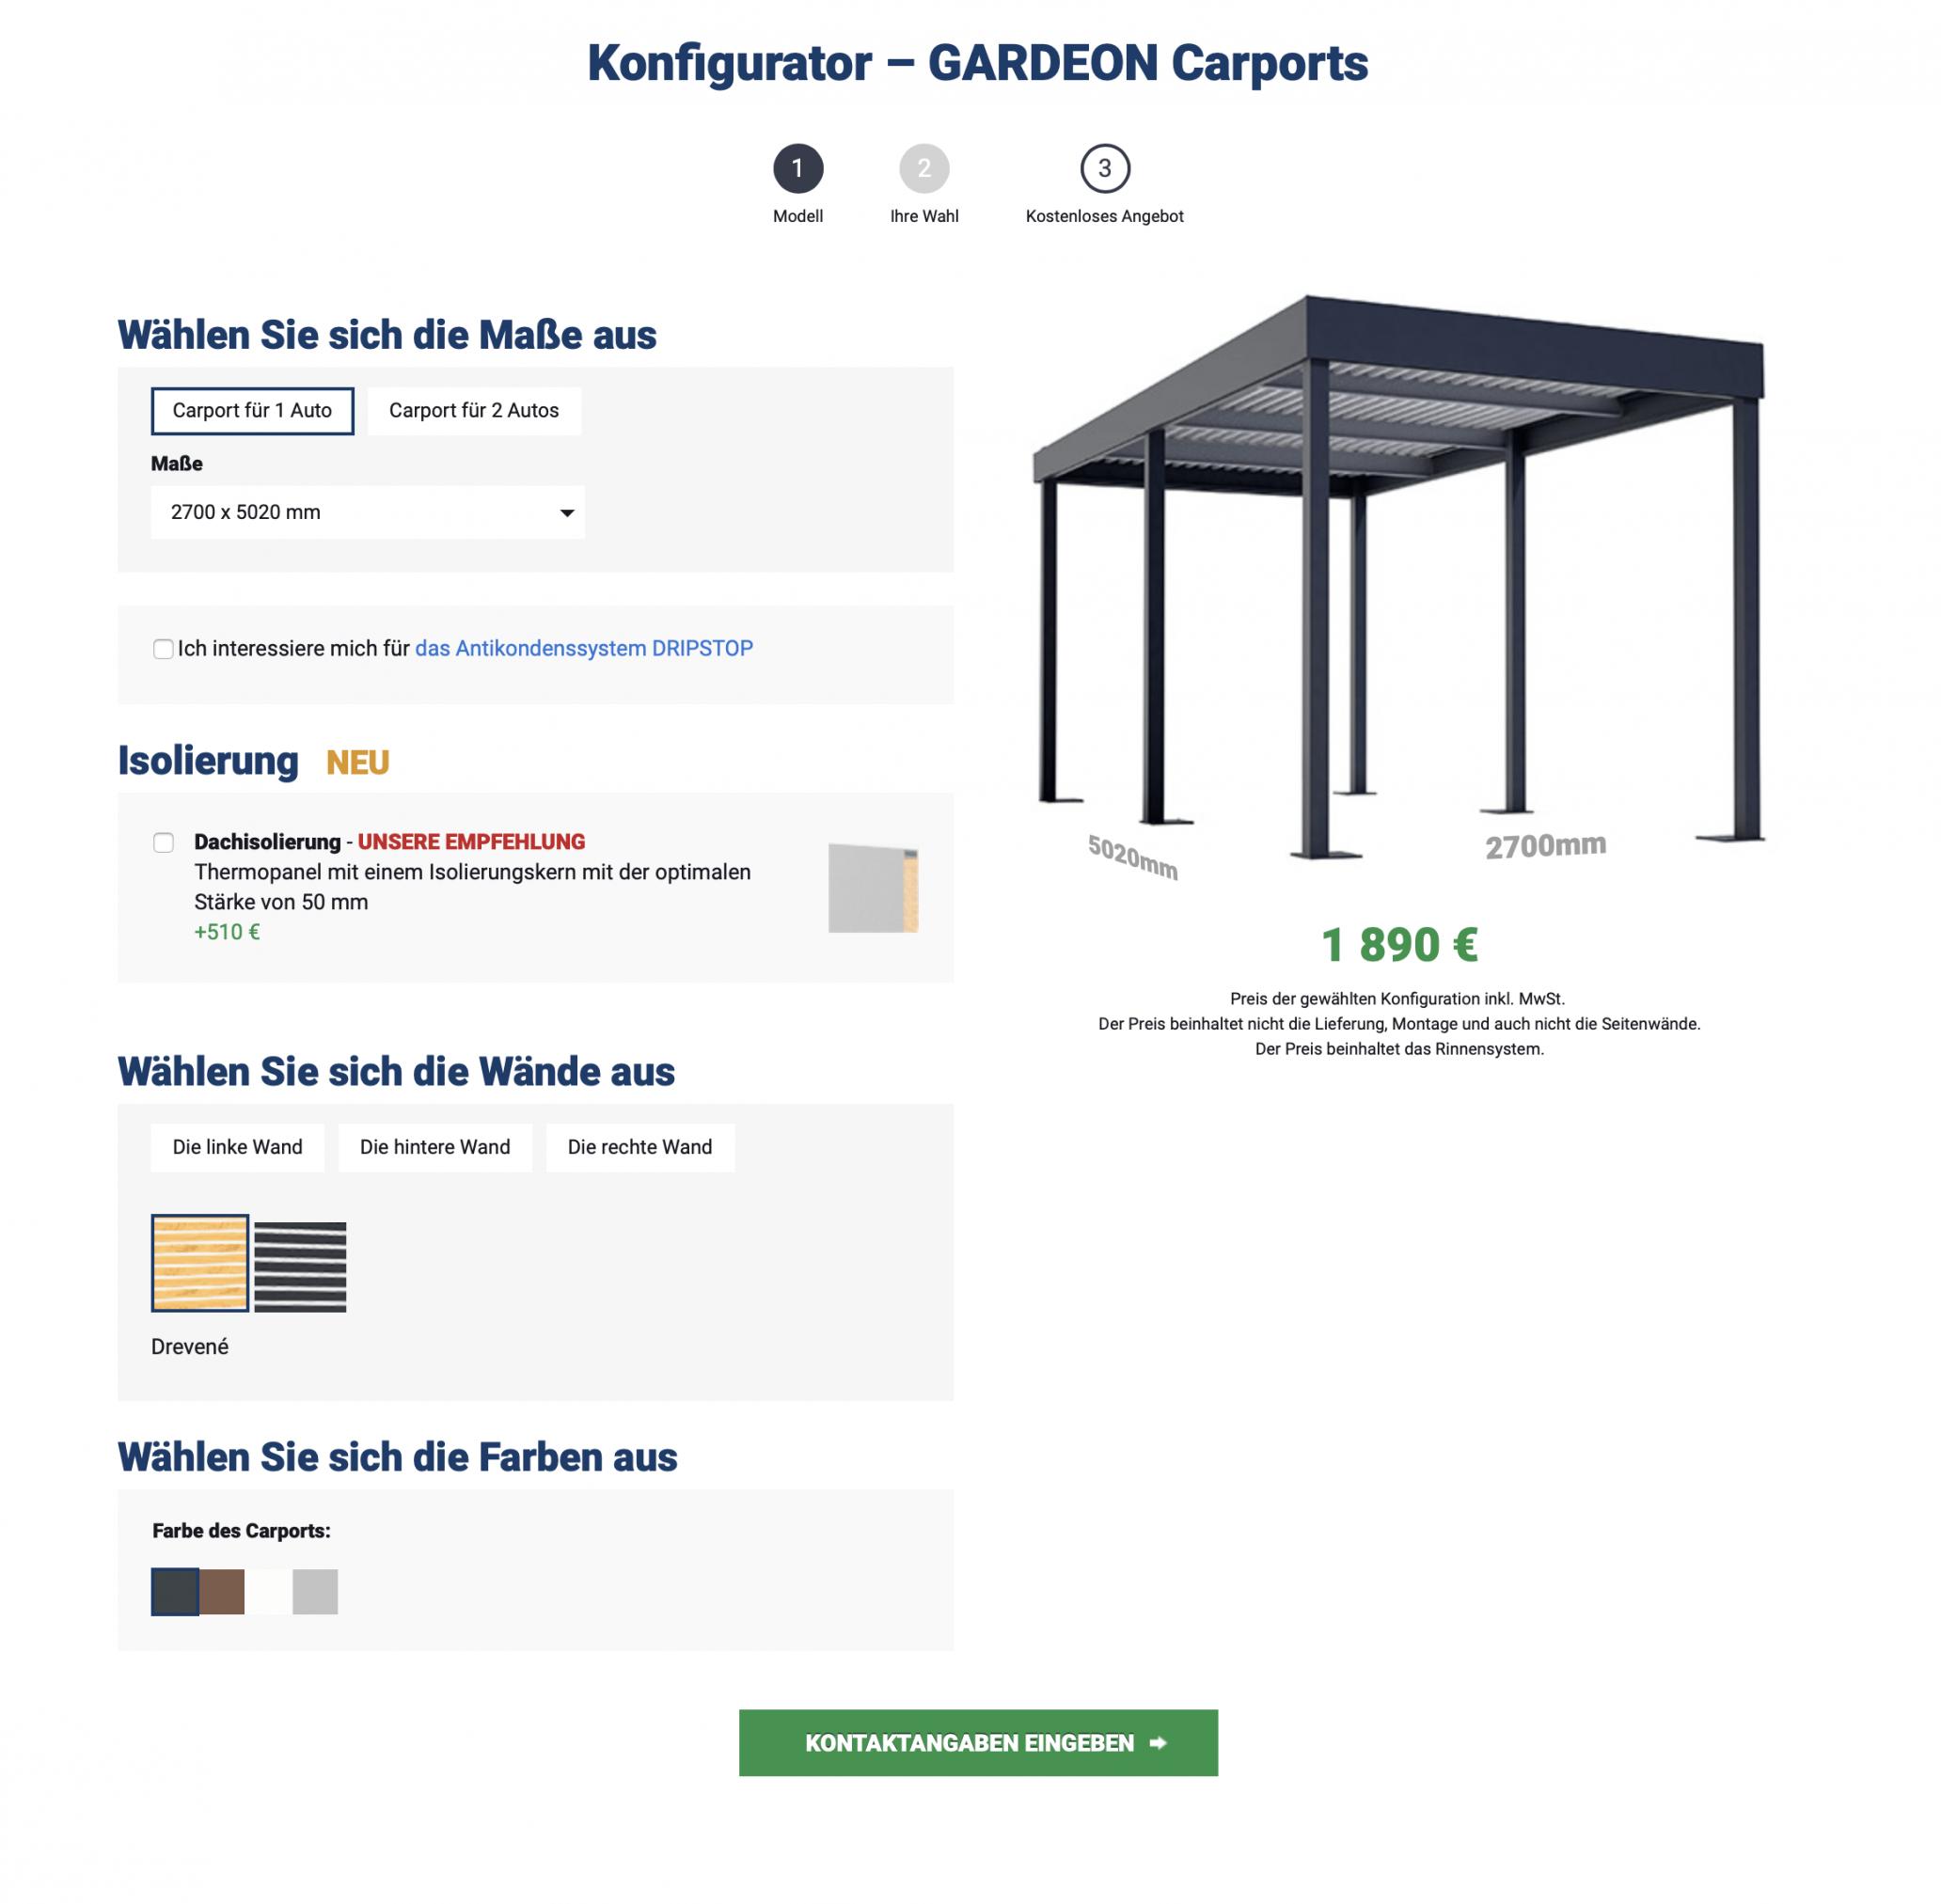 Konfigurator - Carports